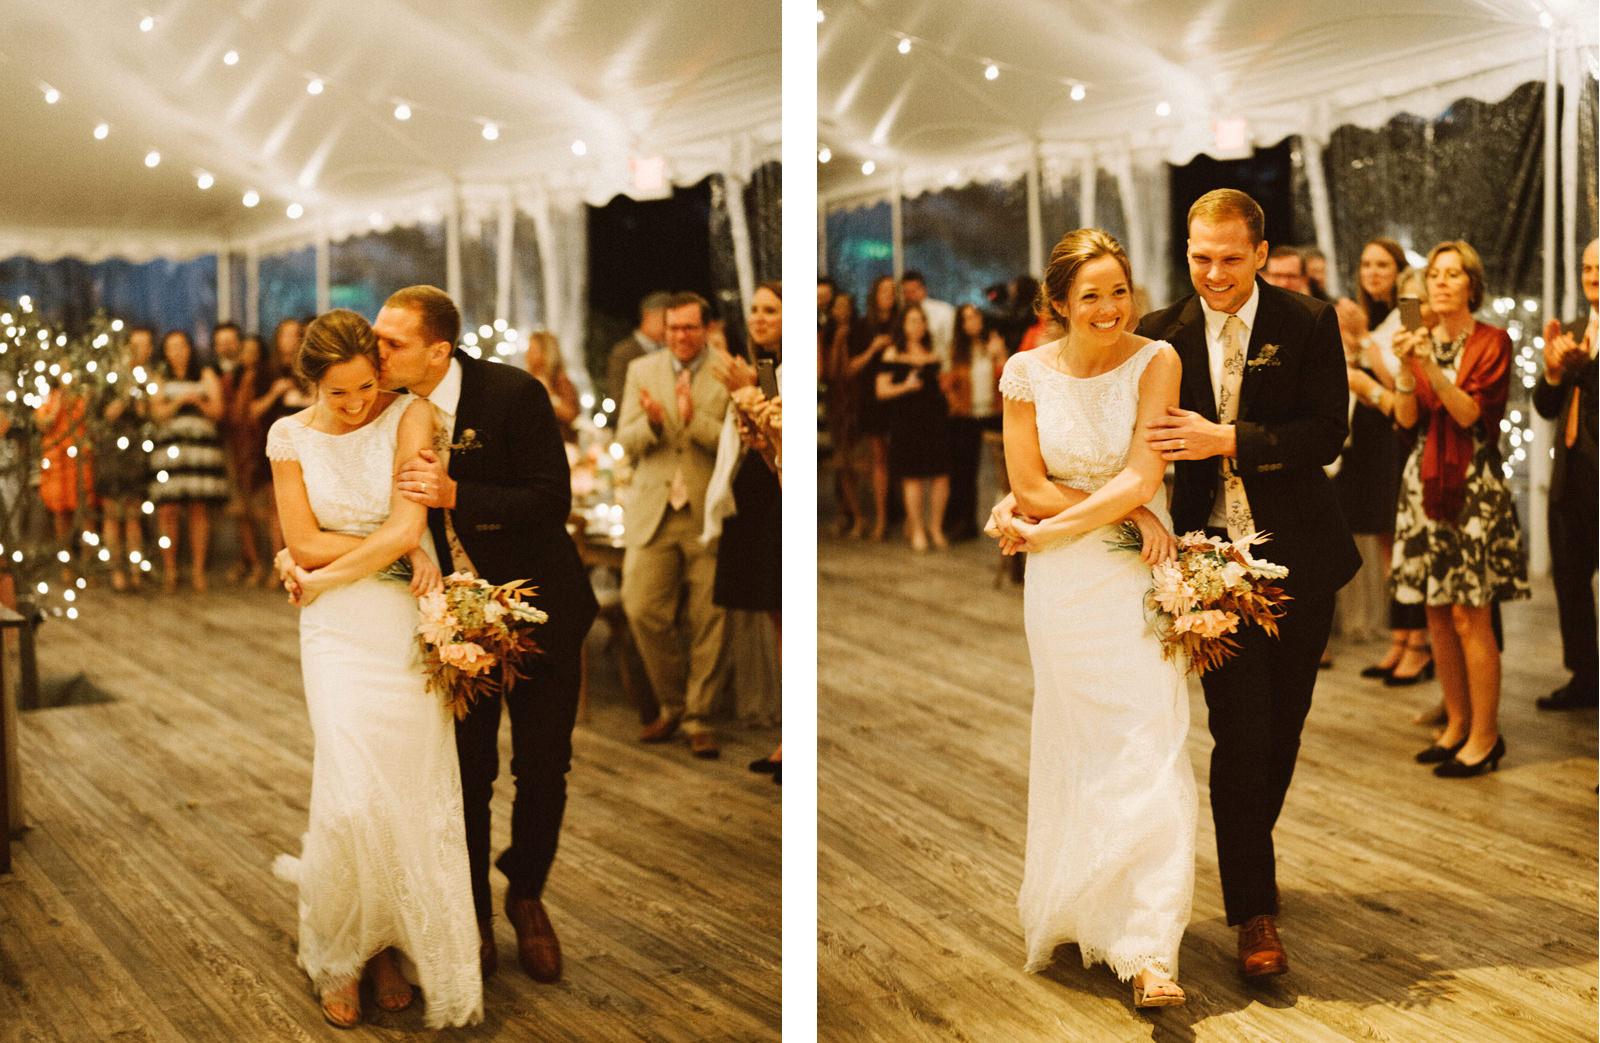 bridgeport-wedding-138 BRIDGEPORT, CONNECTICUT BACKYARD WEDDING